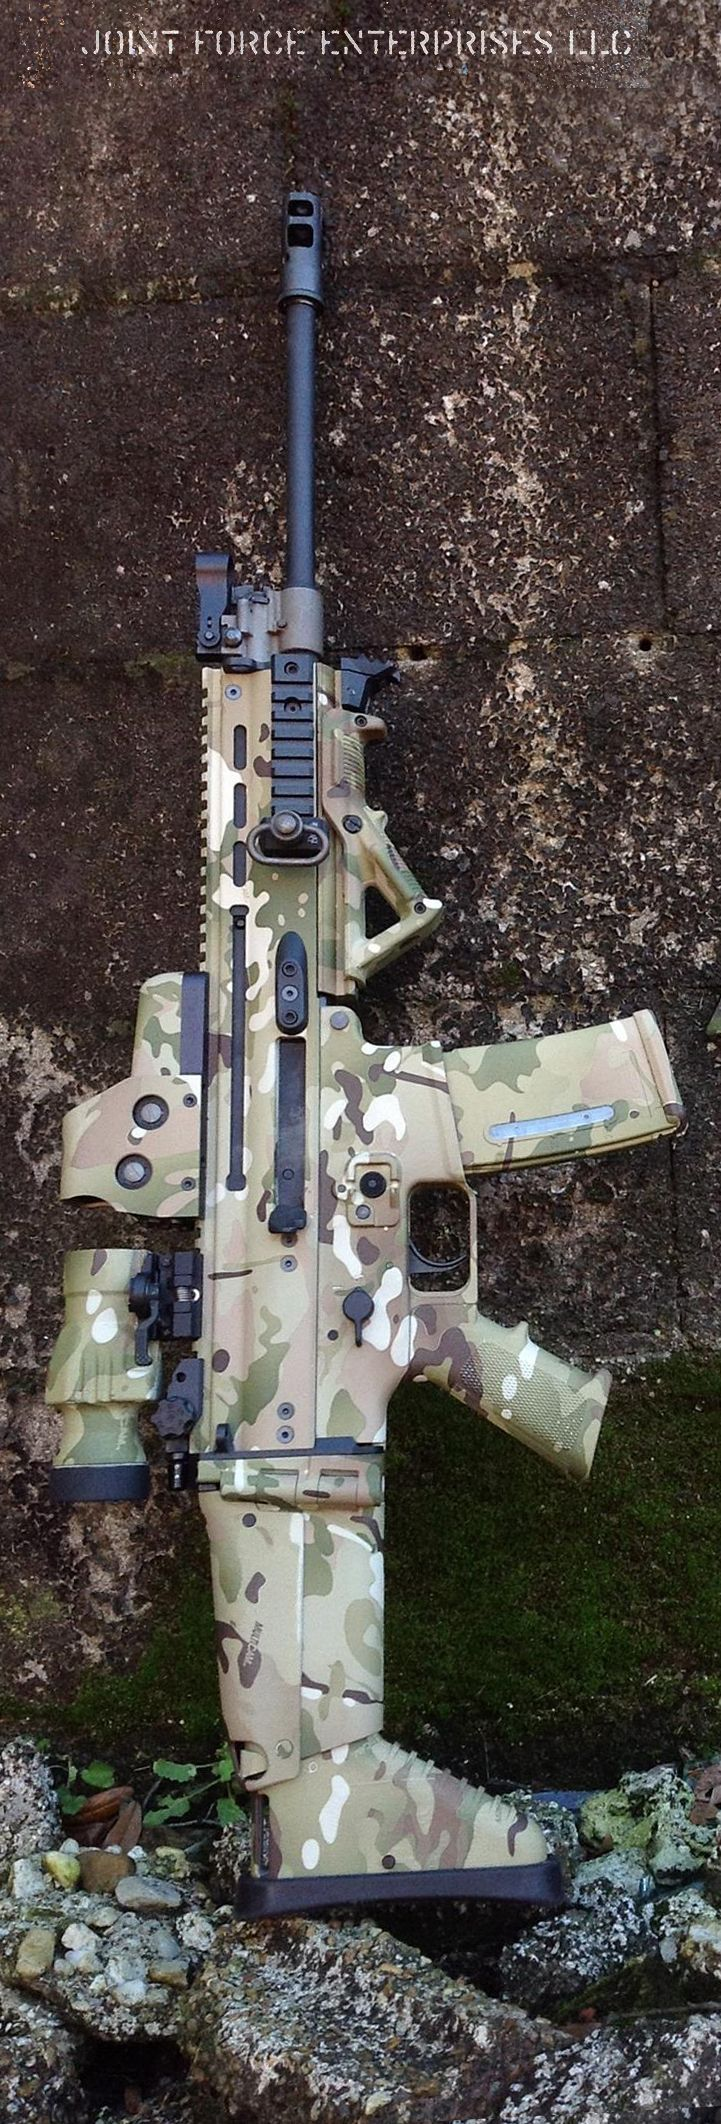 Custom SCAR by Joint Force Enterprises.